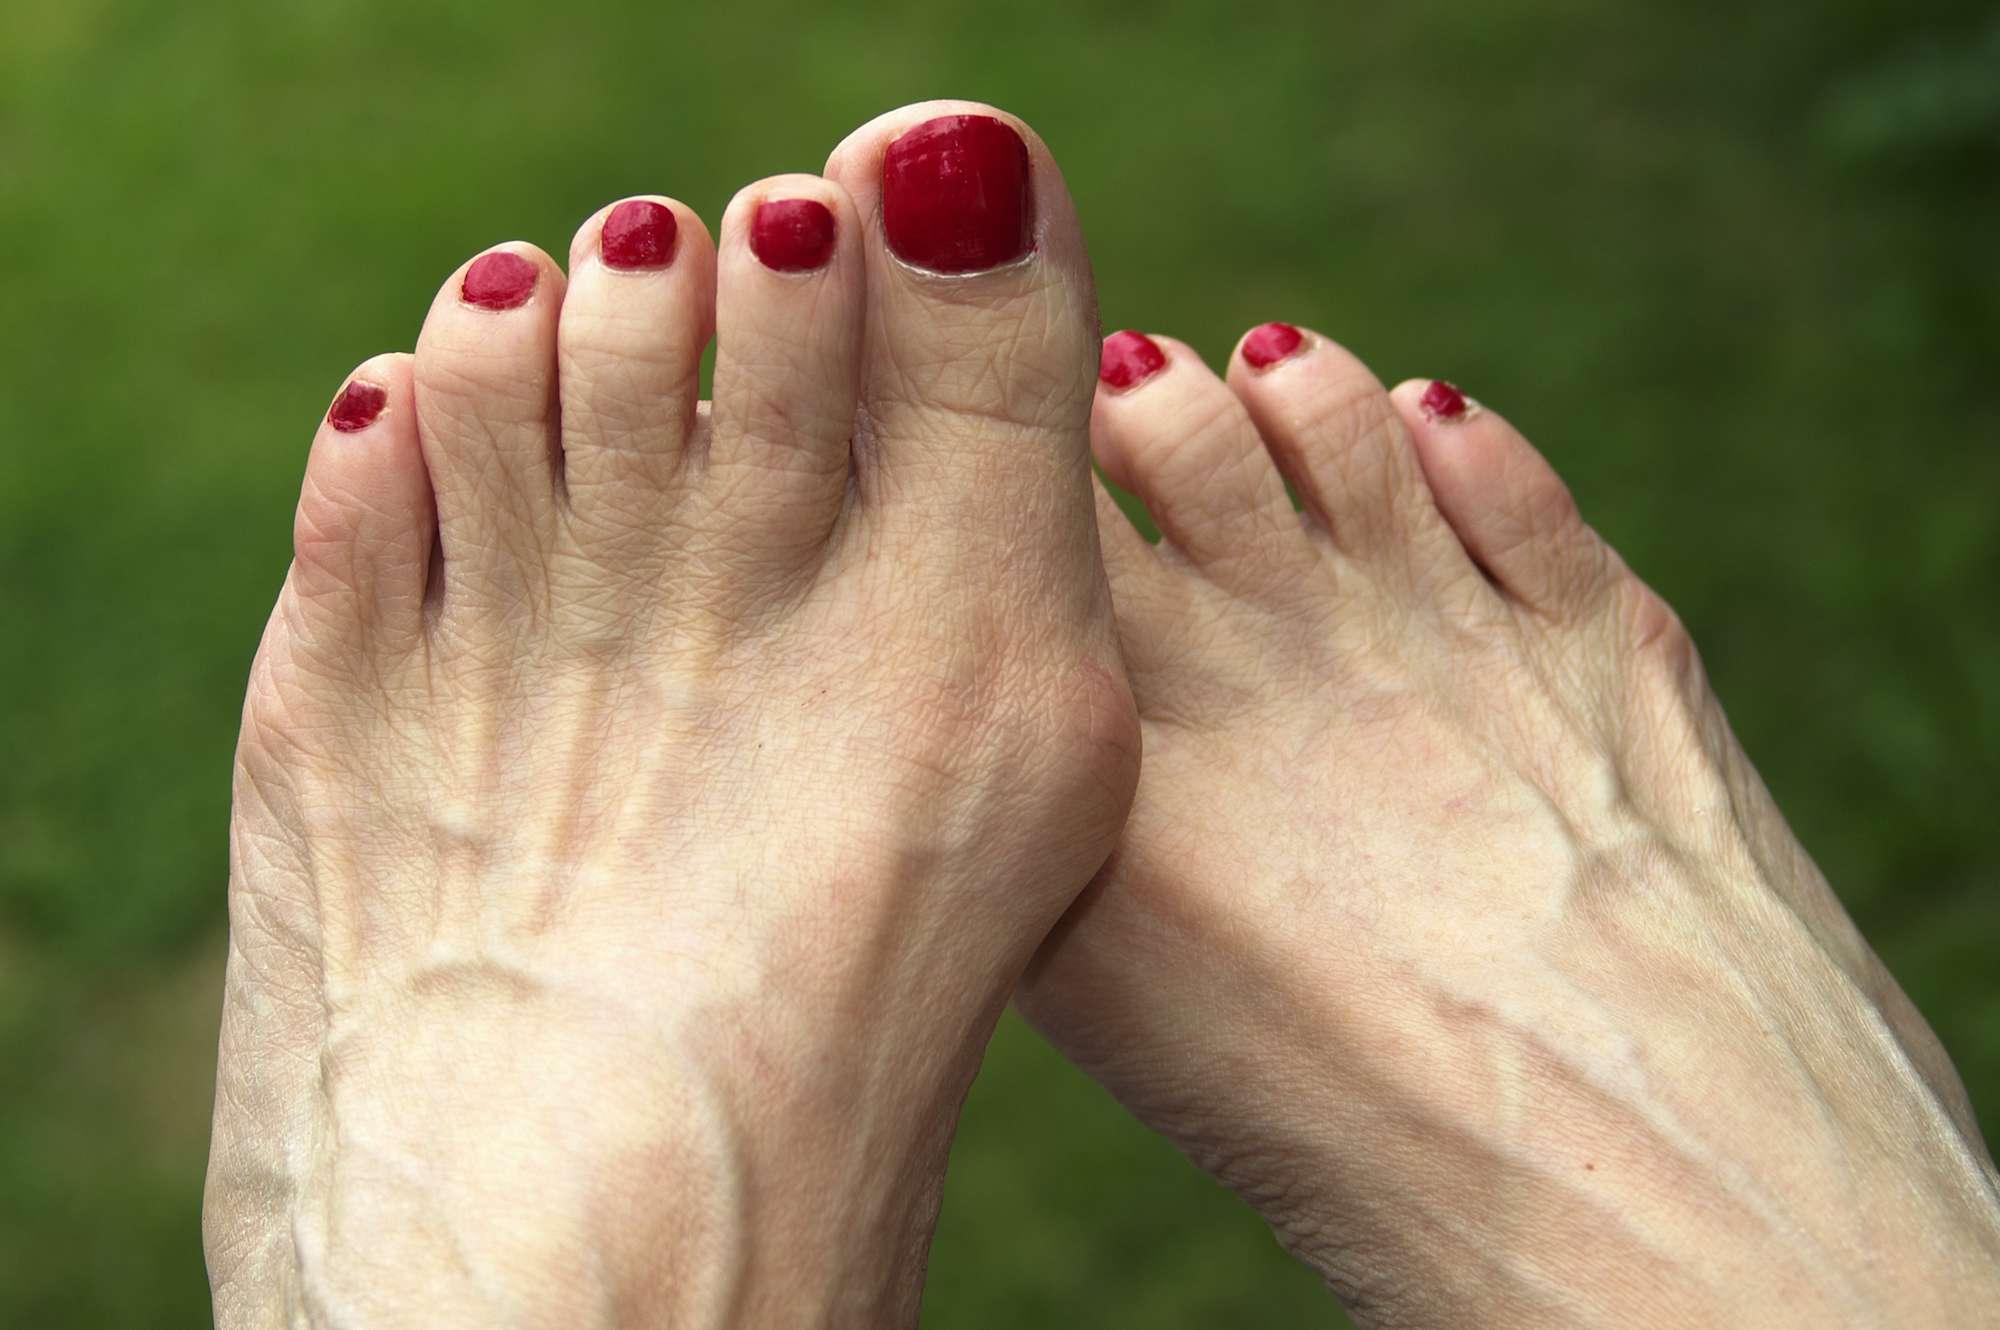 Woman's feet with bunions